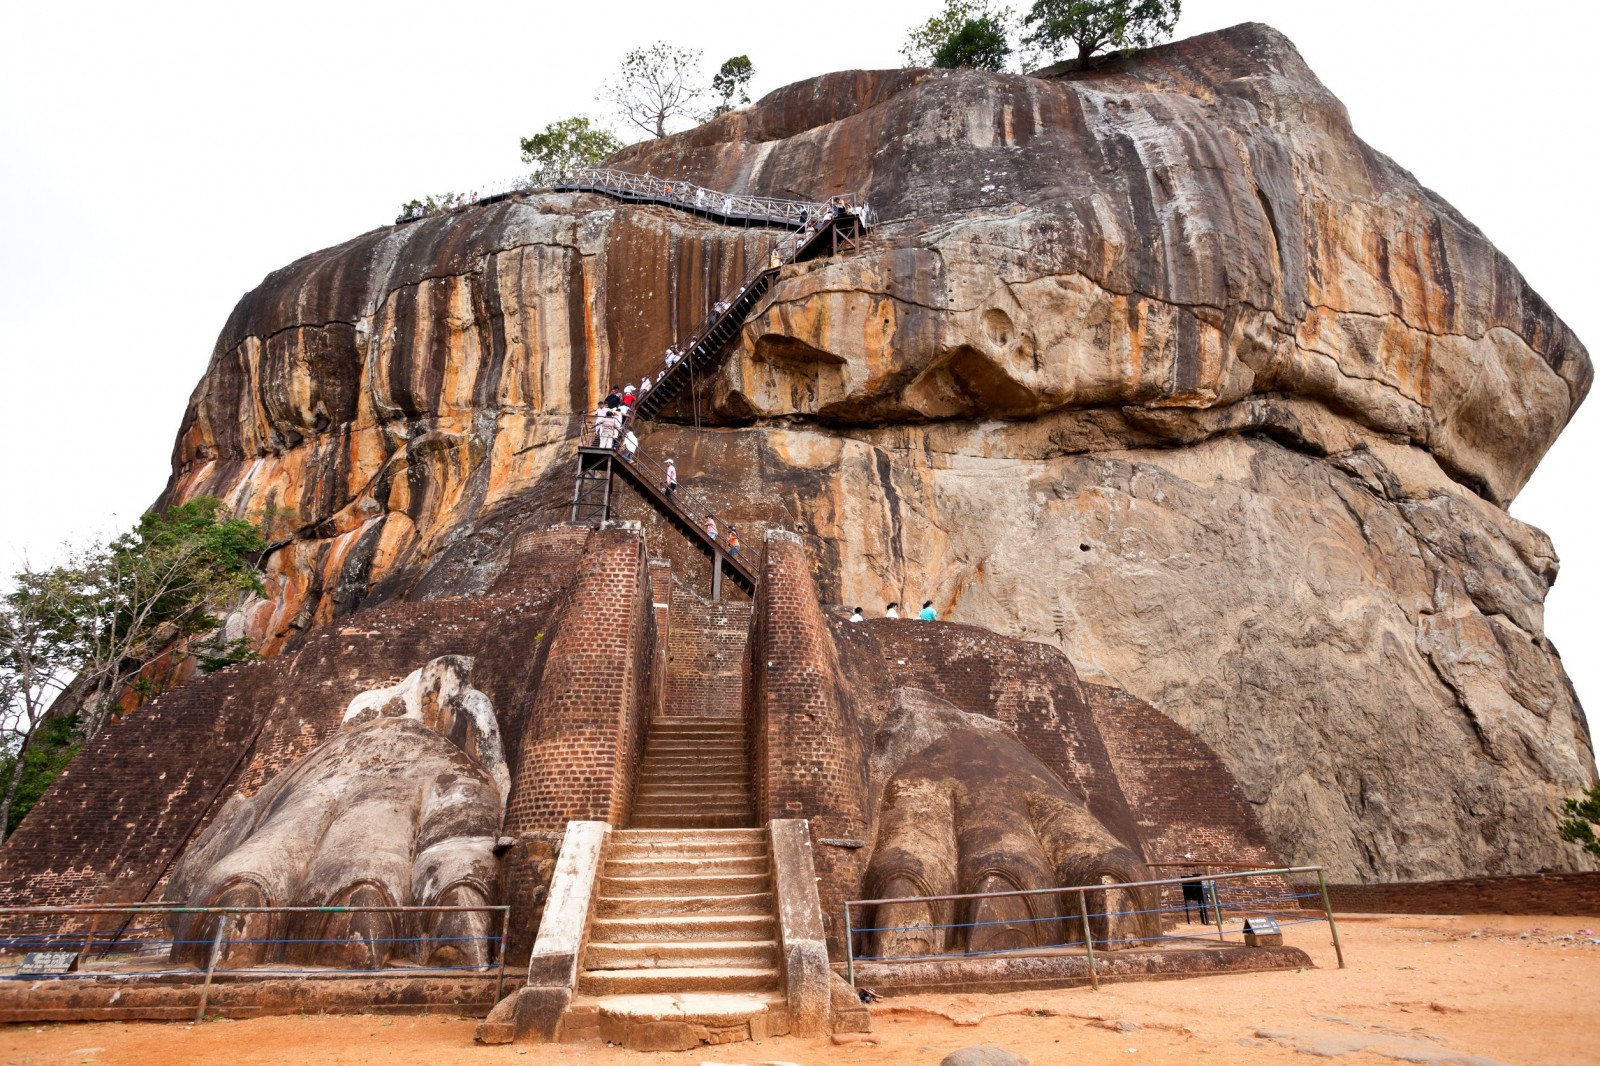 Sigiriya-Ruins-of-the-Lion-Mouth-entrance